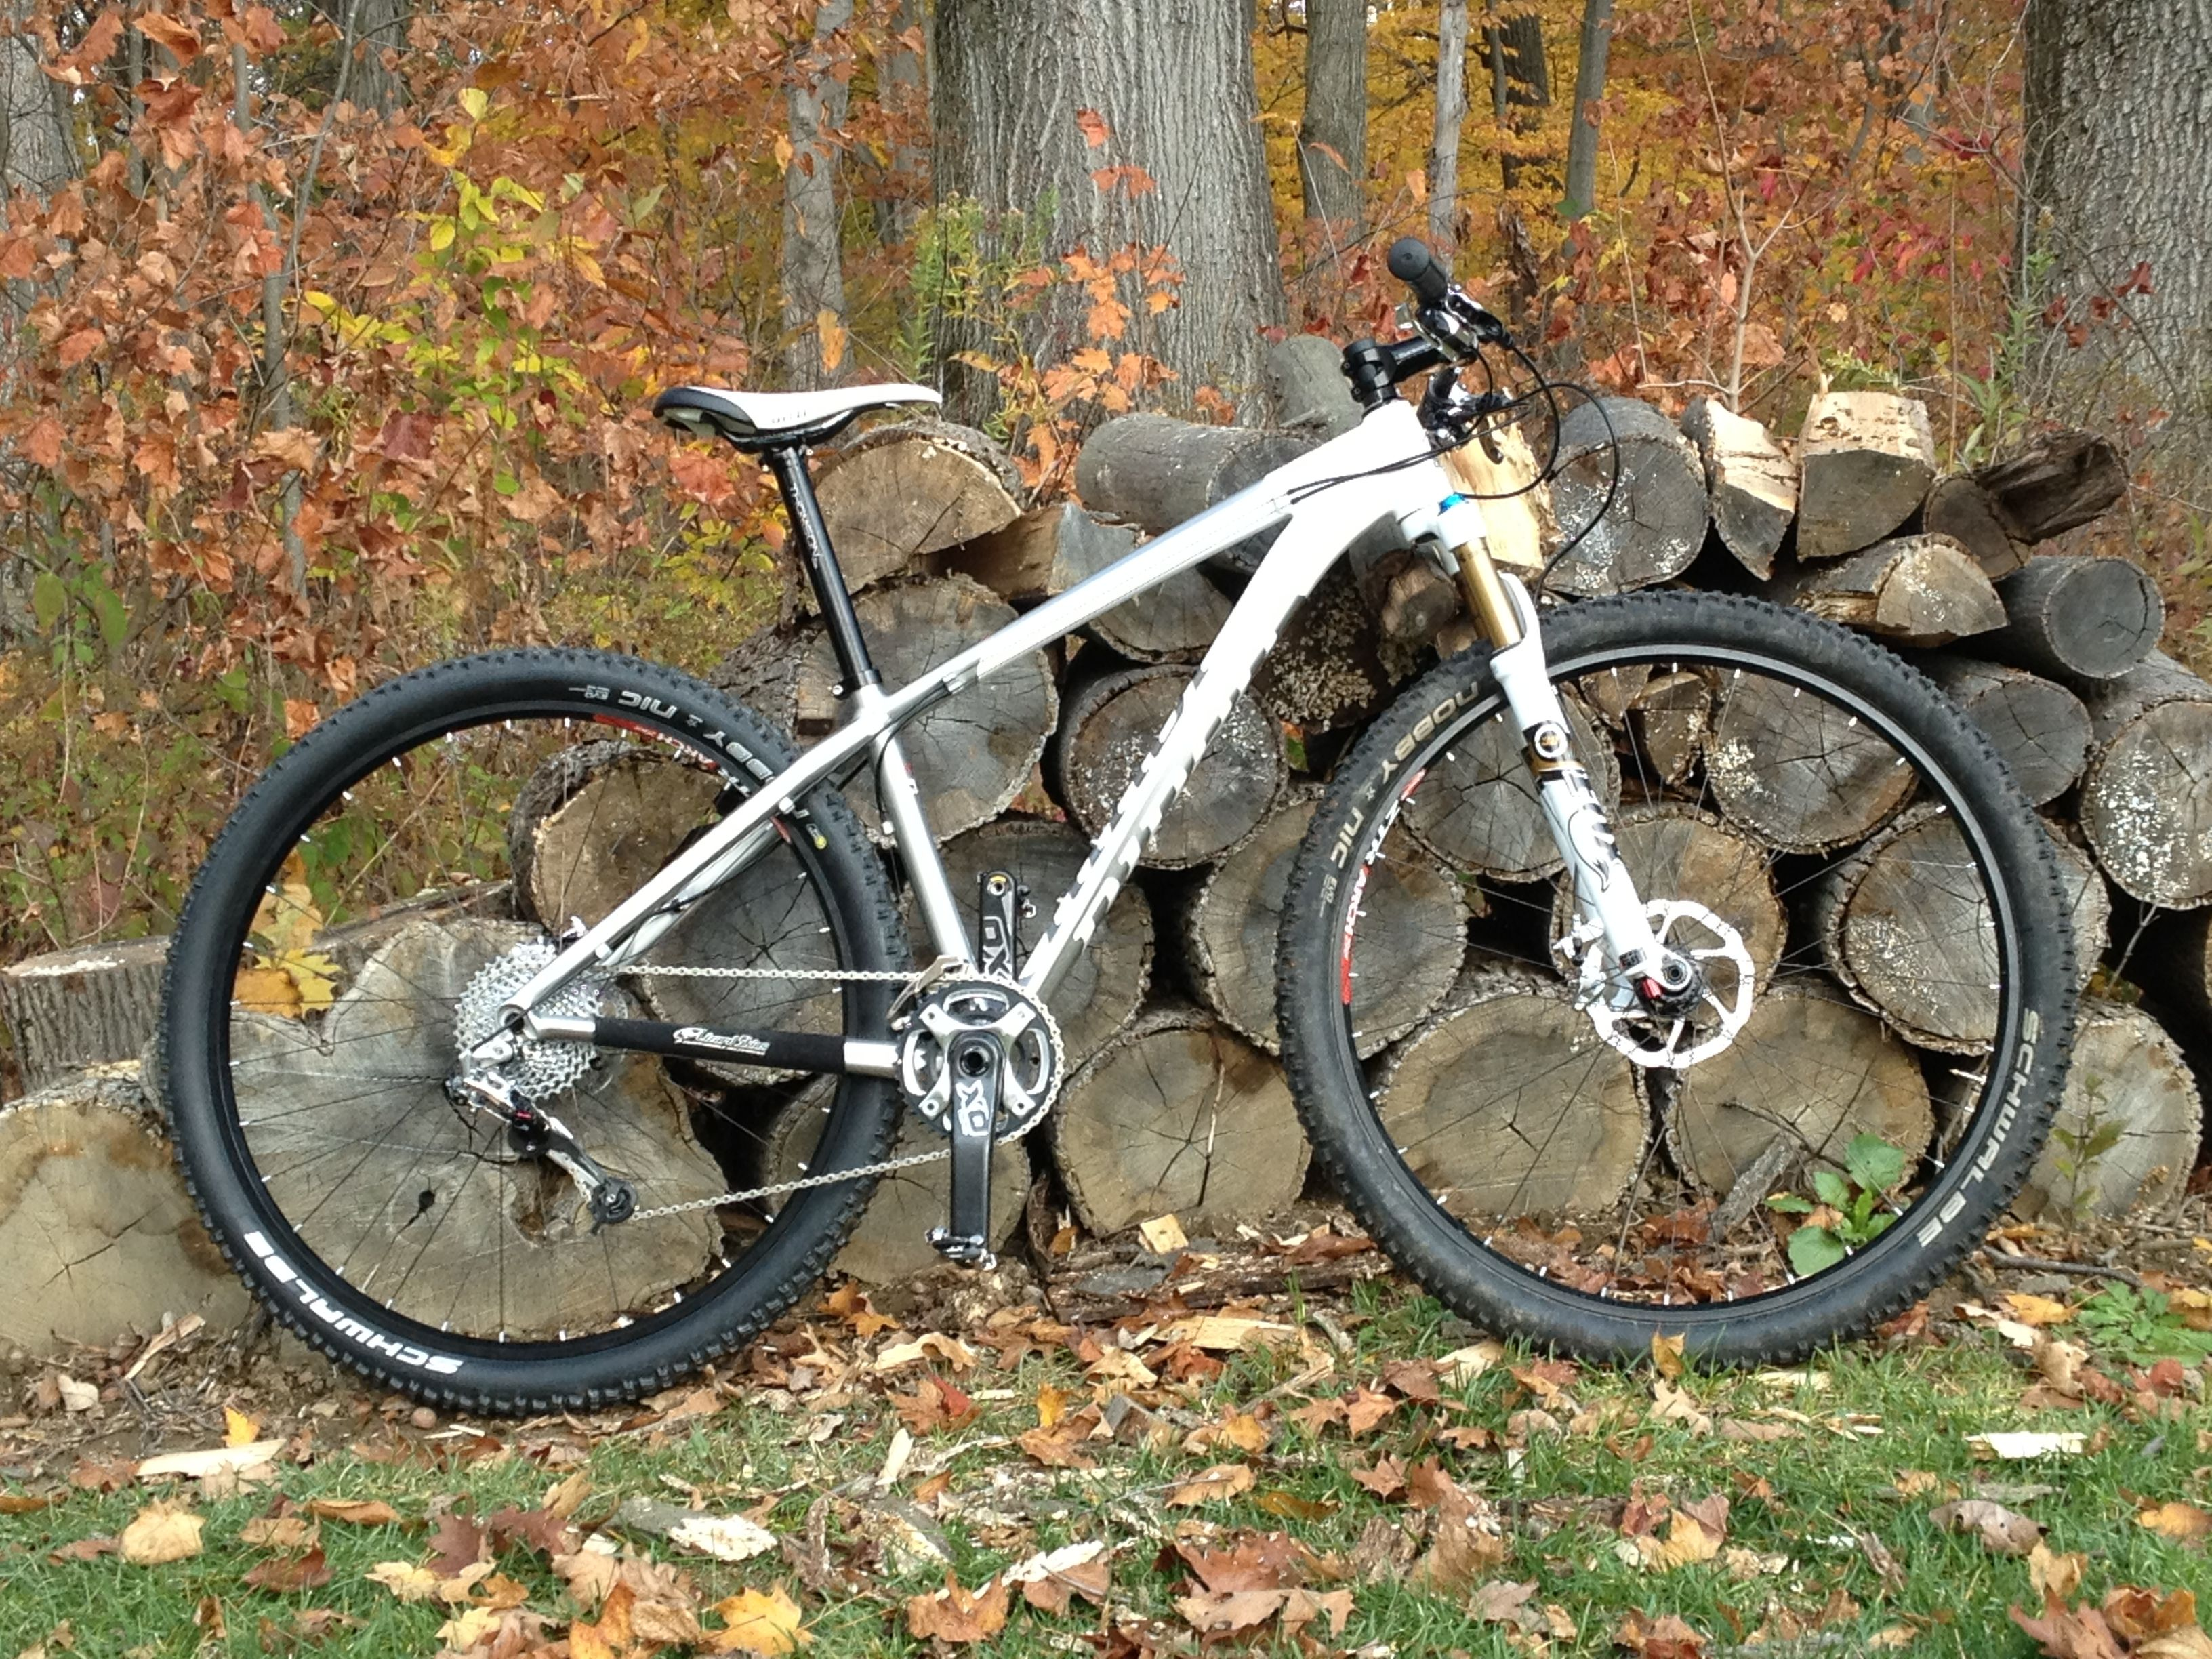 2012 Niner Air 9 (With images) Super bikes, Bike